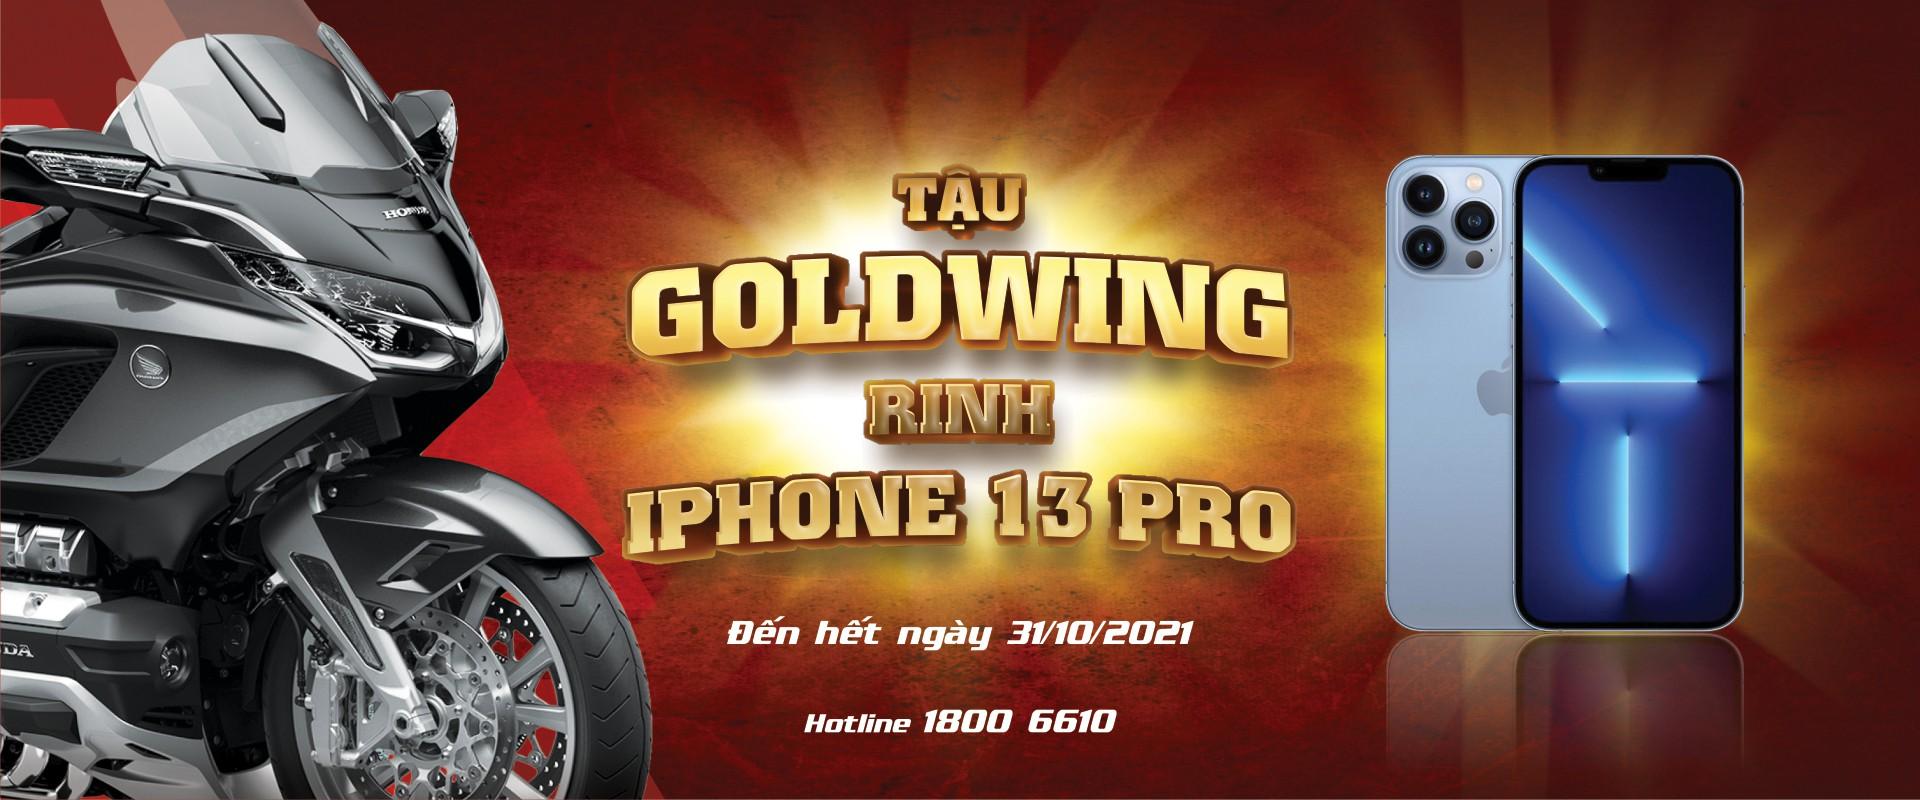 Tậu Goldwing - Rinh Iphone